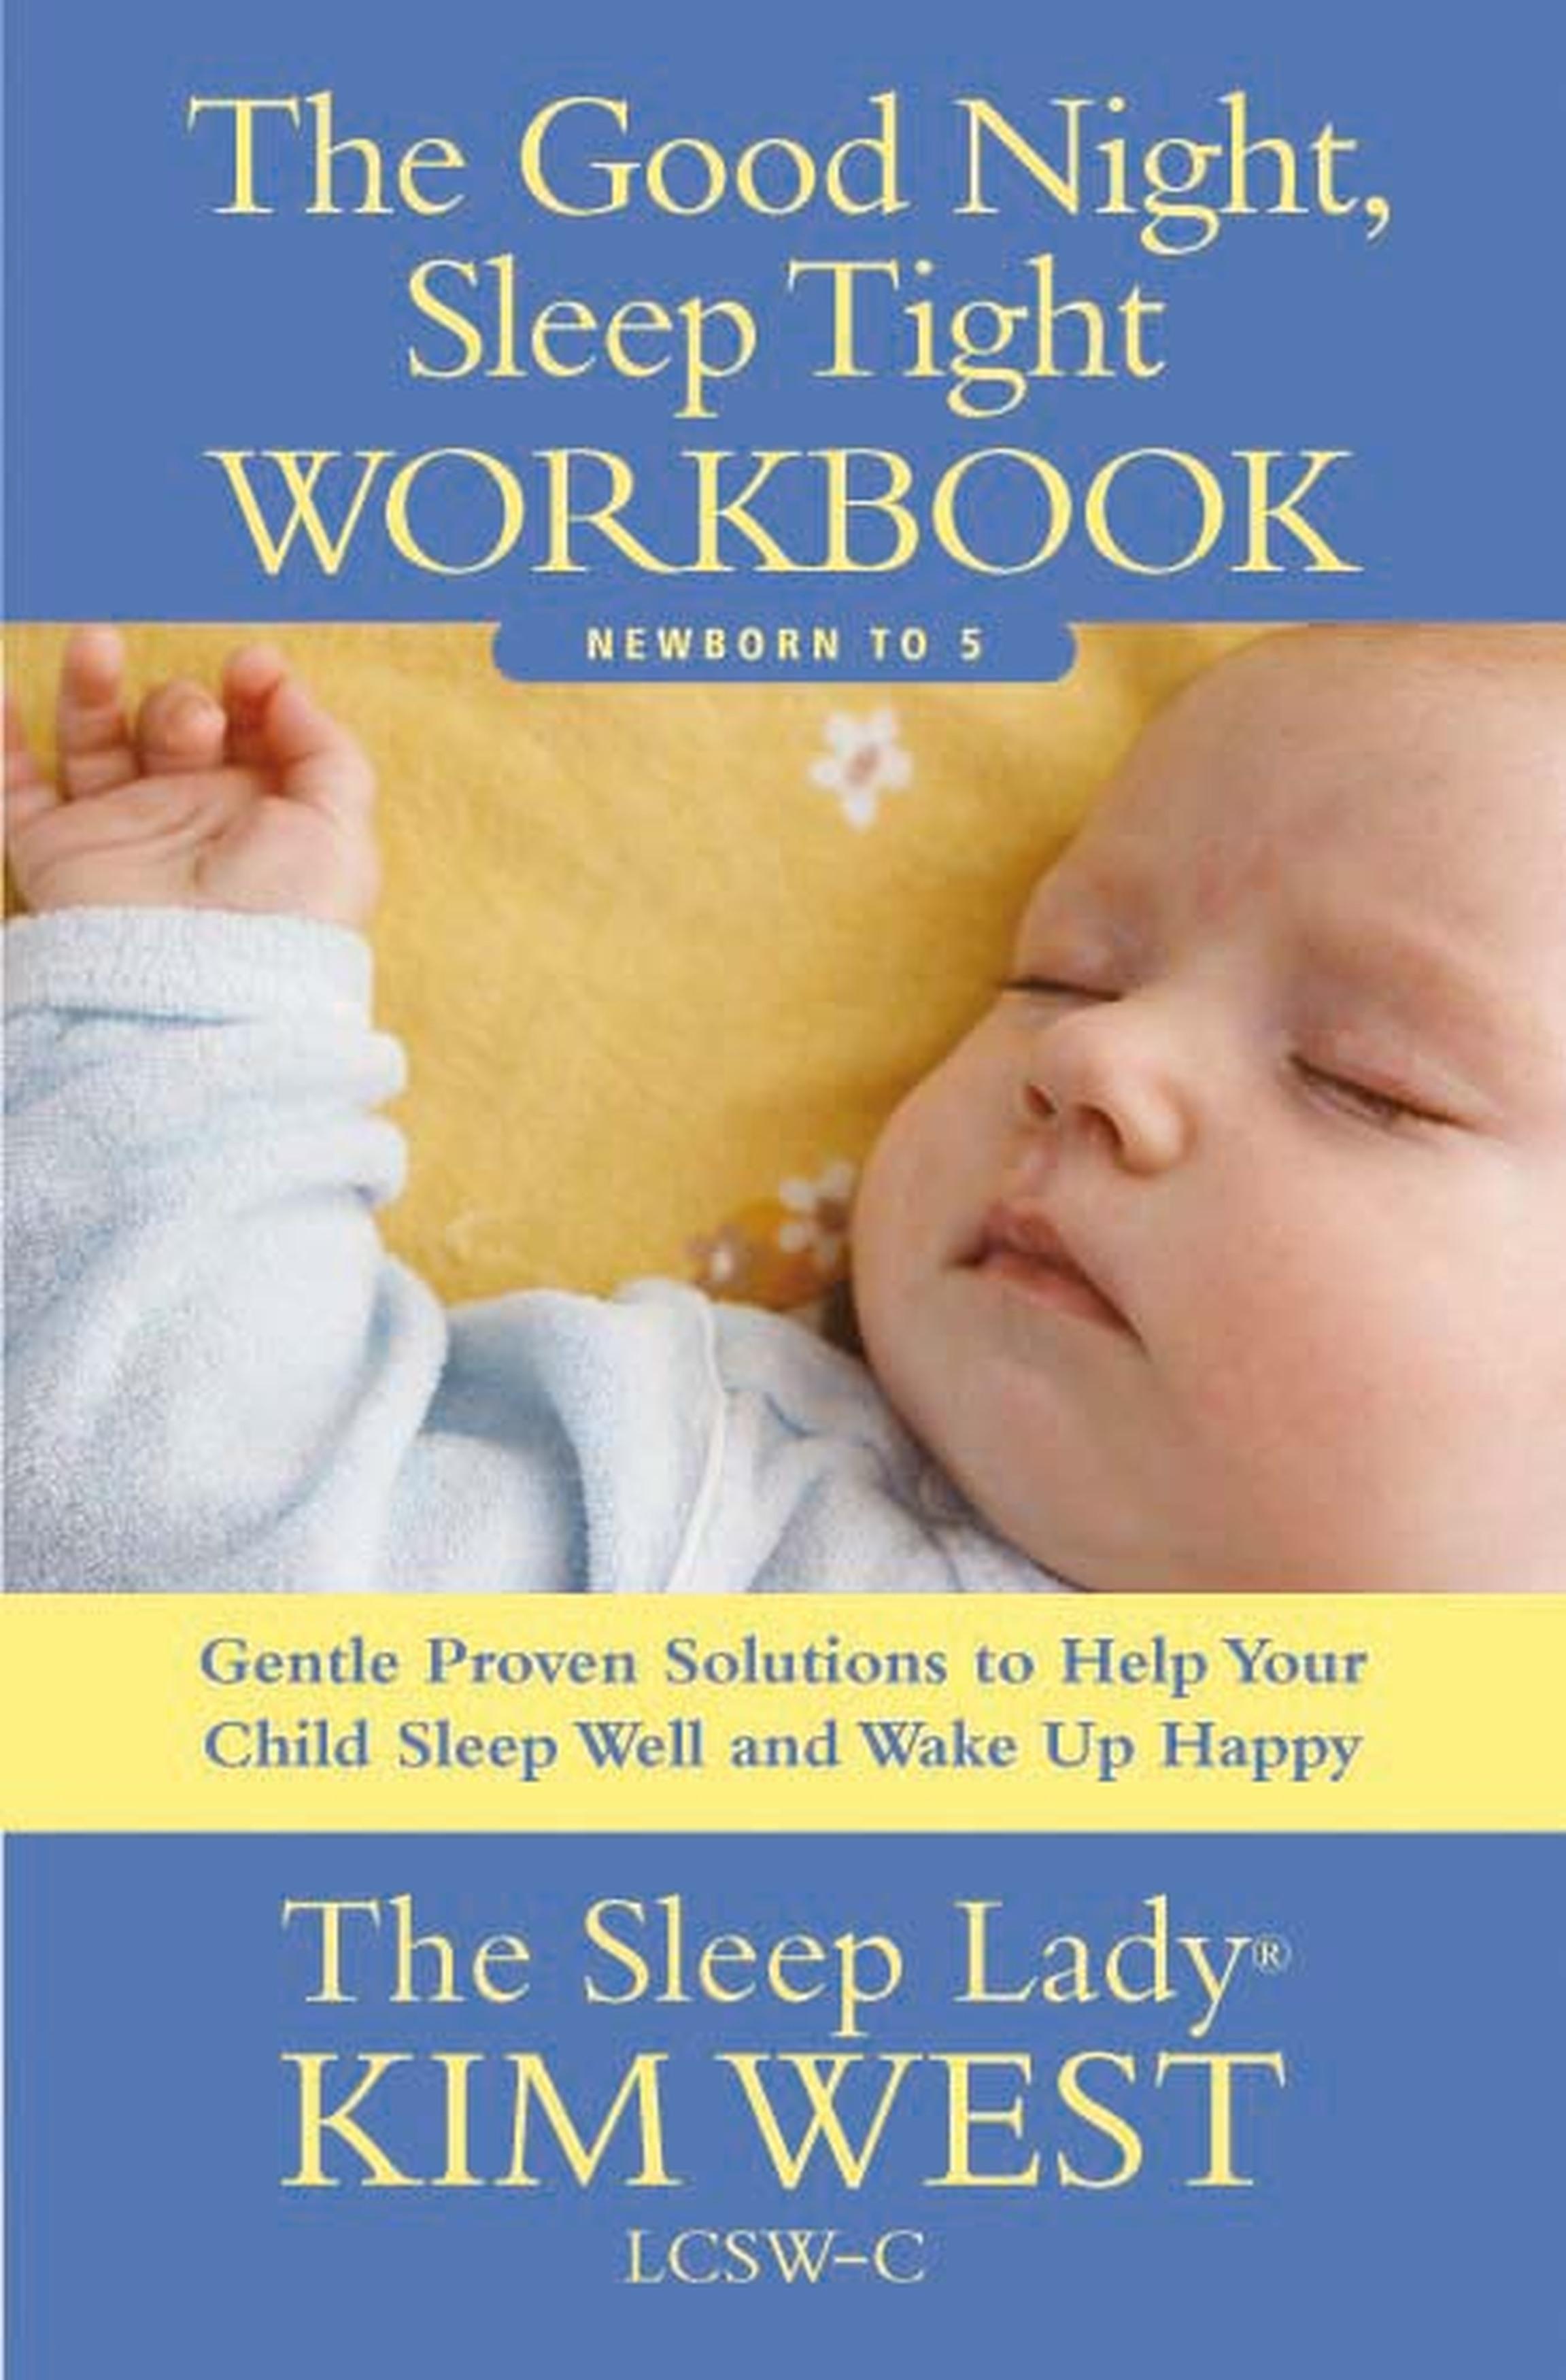 Good Night Sleep Tight Workbook 0 Chapter 1 - FREE